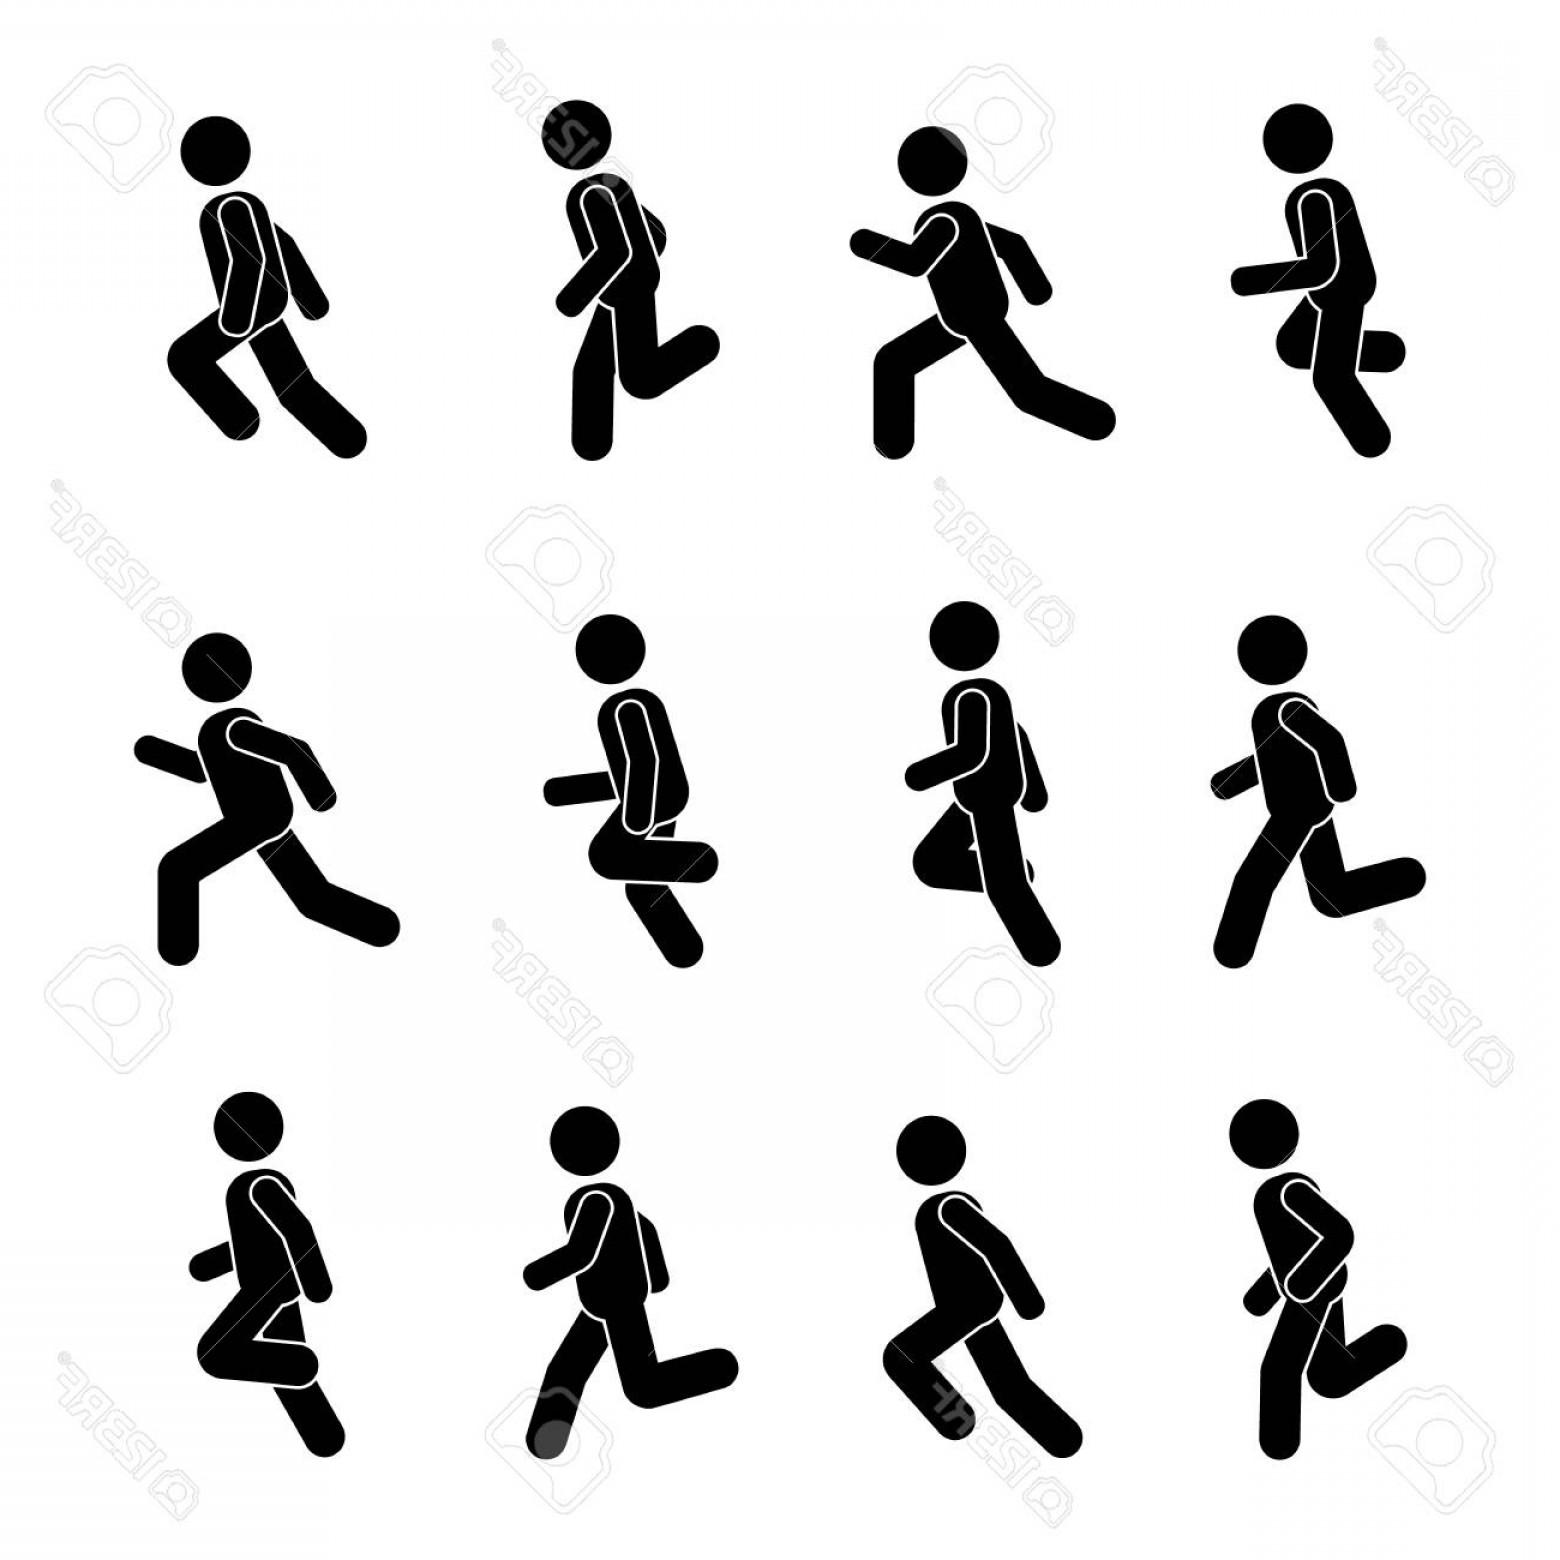 1560x1560 Photostock Vector Man People Various Running Position Posture